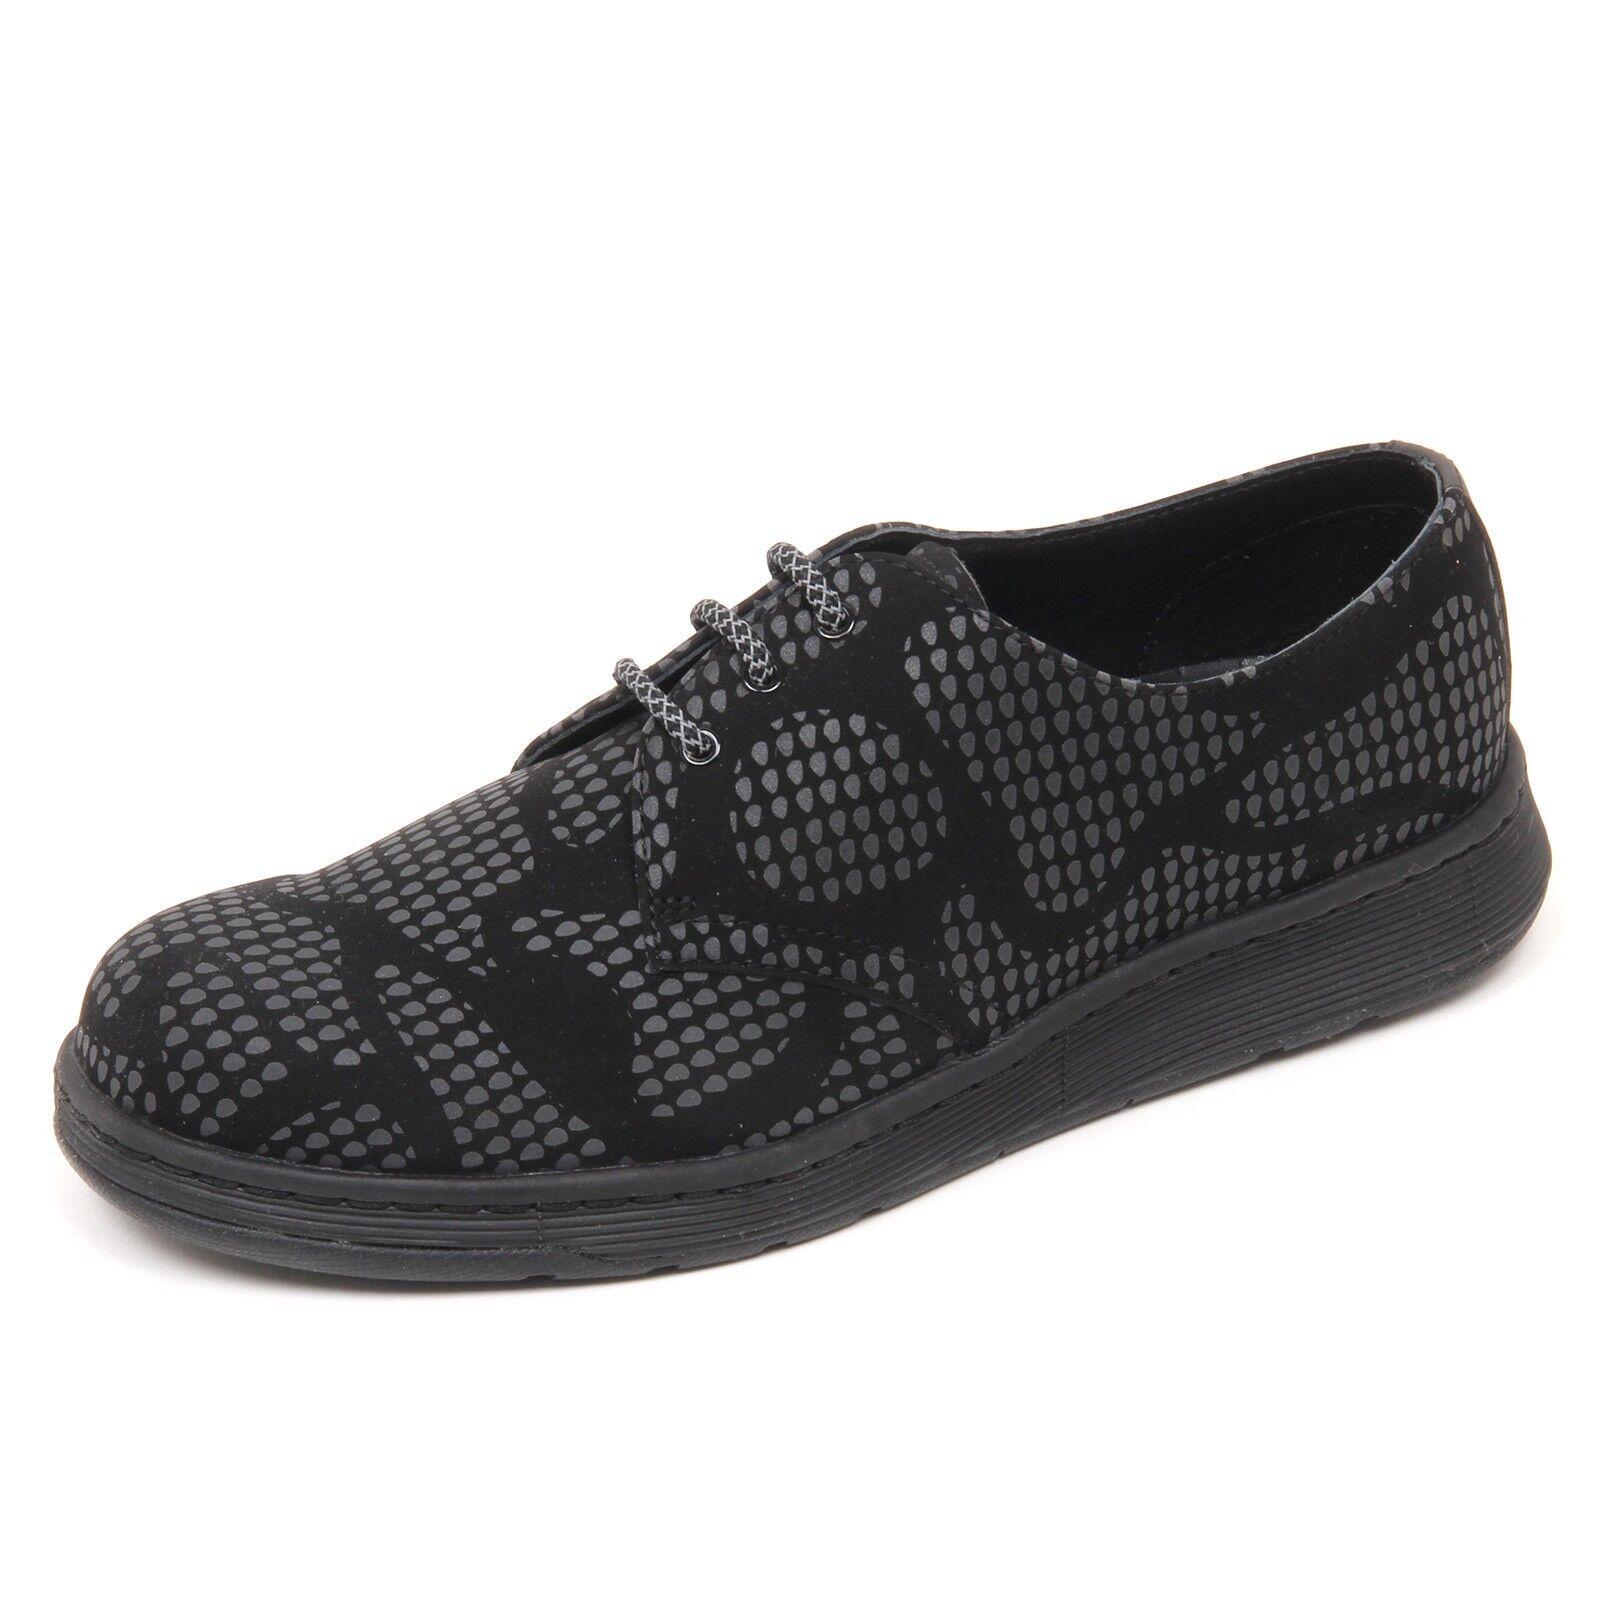 D1968 scarpa uomo DR. MARTENS CAVENDISH scarpe nero shoe man